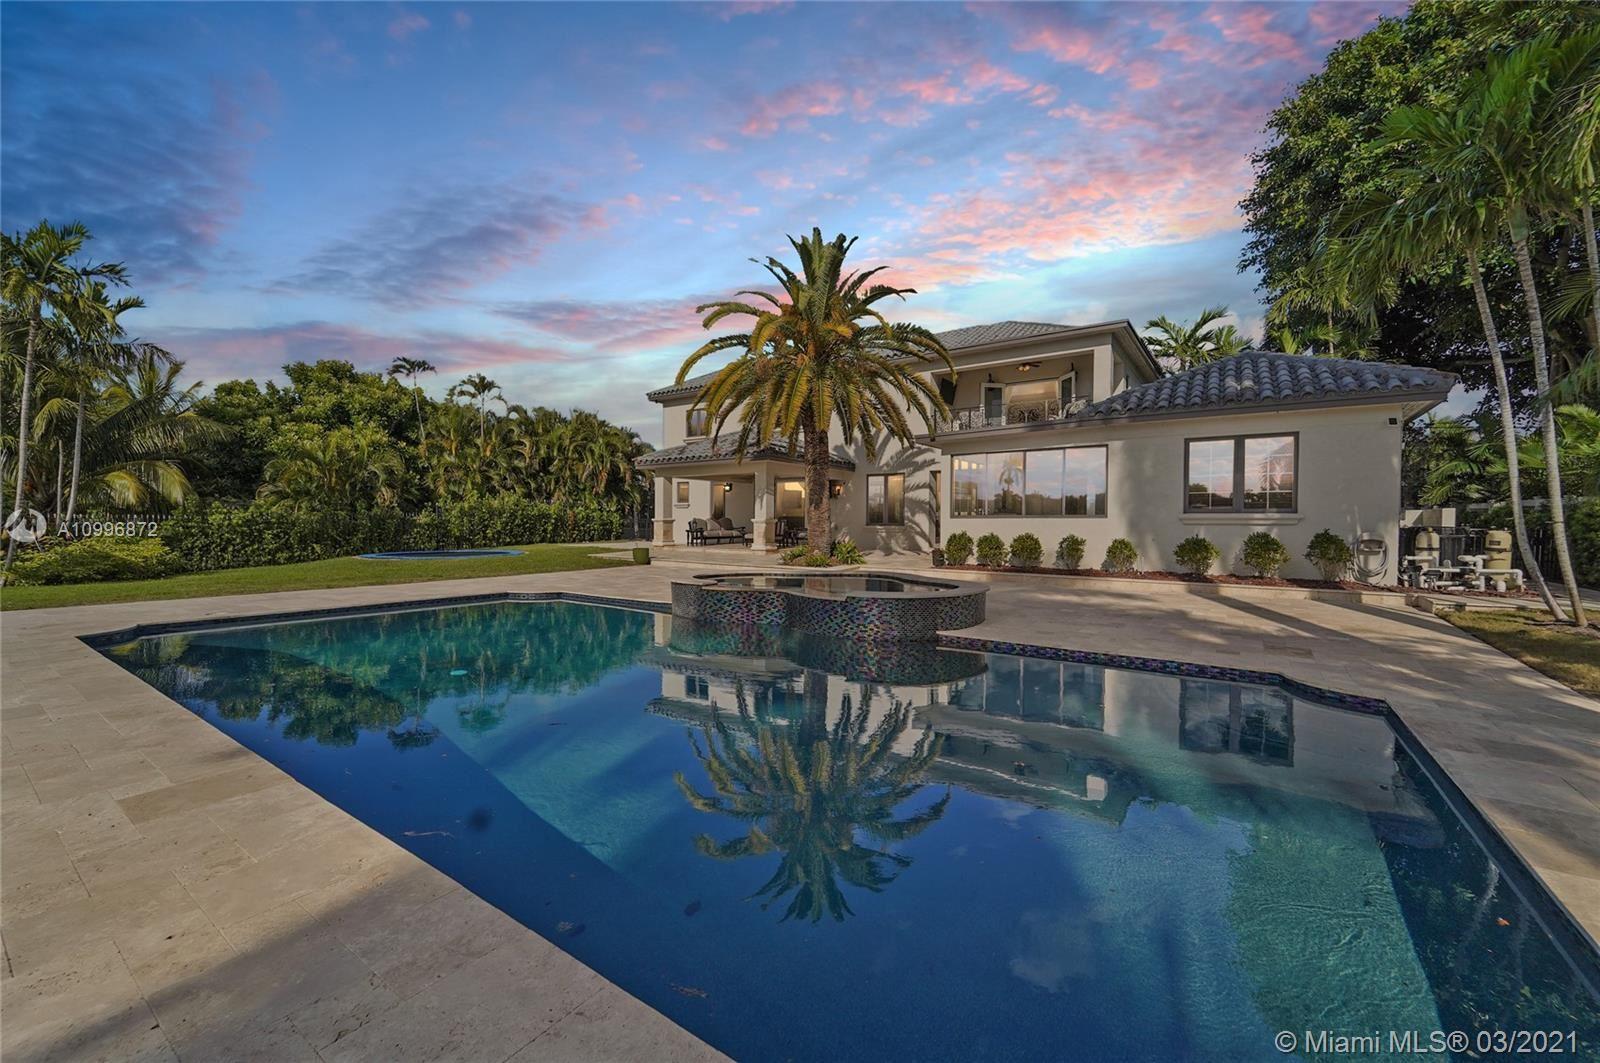 1431 Middle River Dr, Fort Lauderdale, FL 33304 - #: A10996872